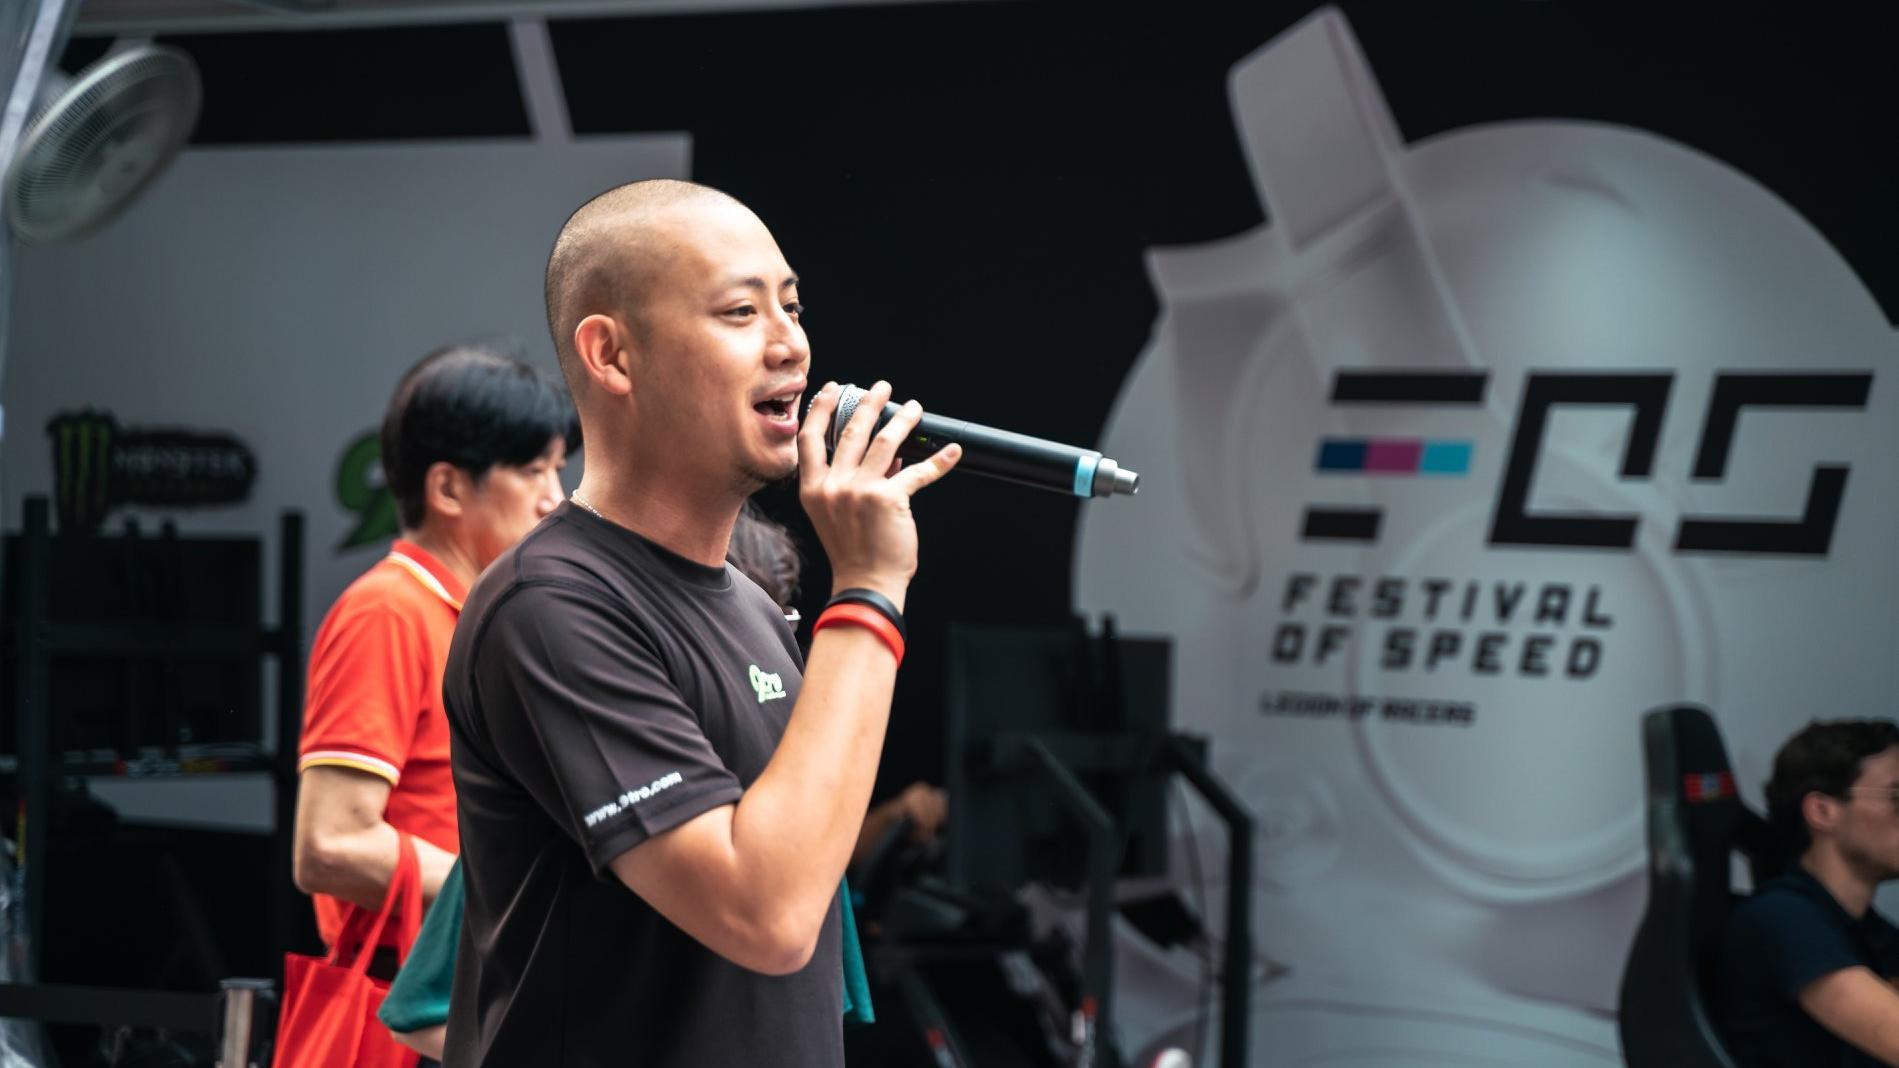 Festival Of Speed 9tro